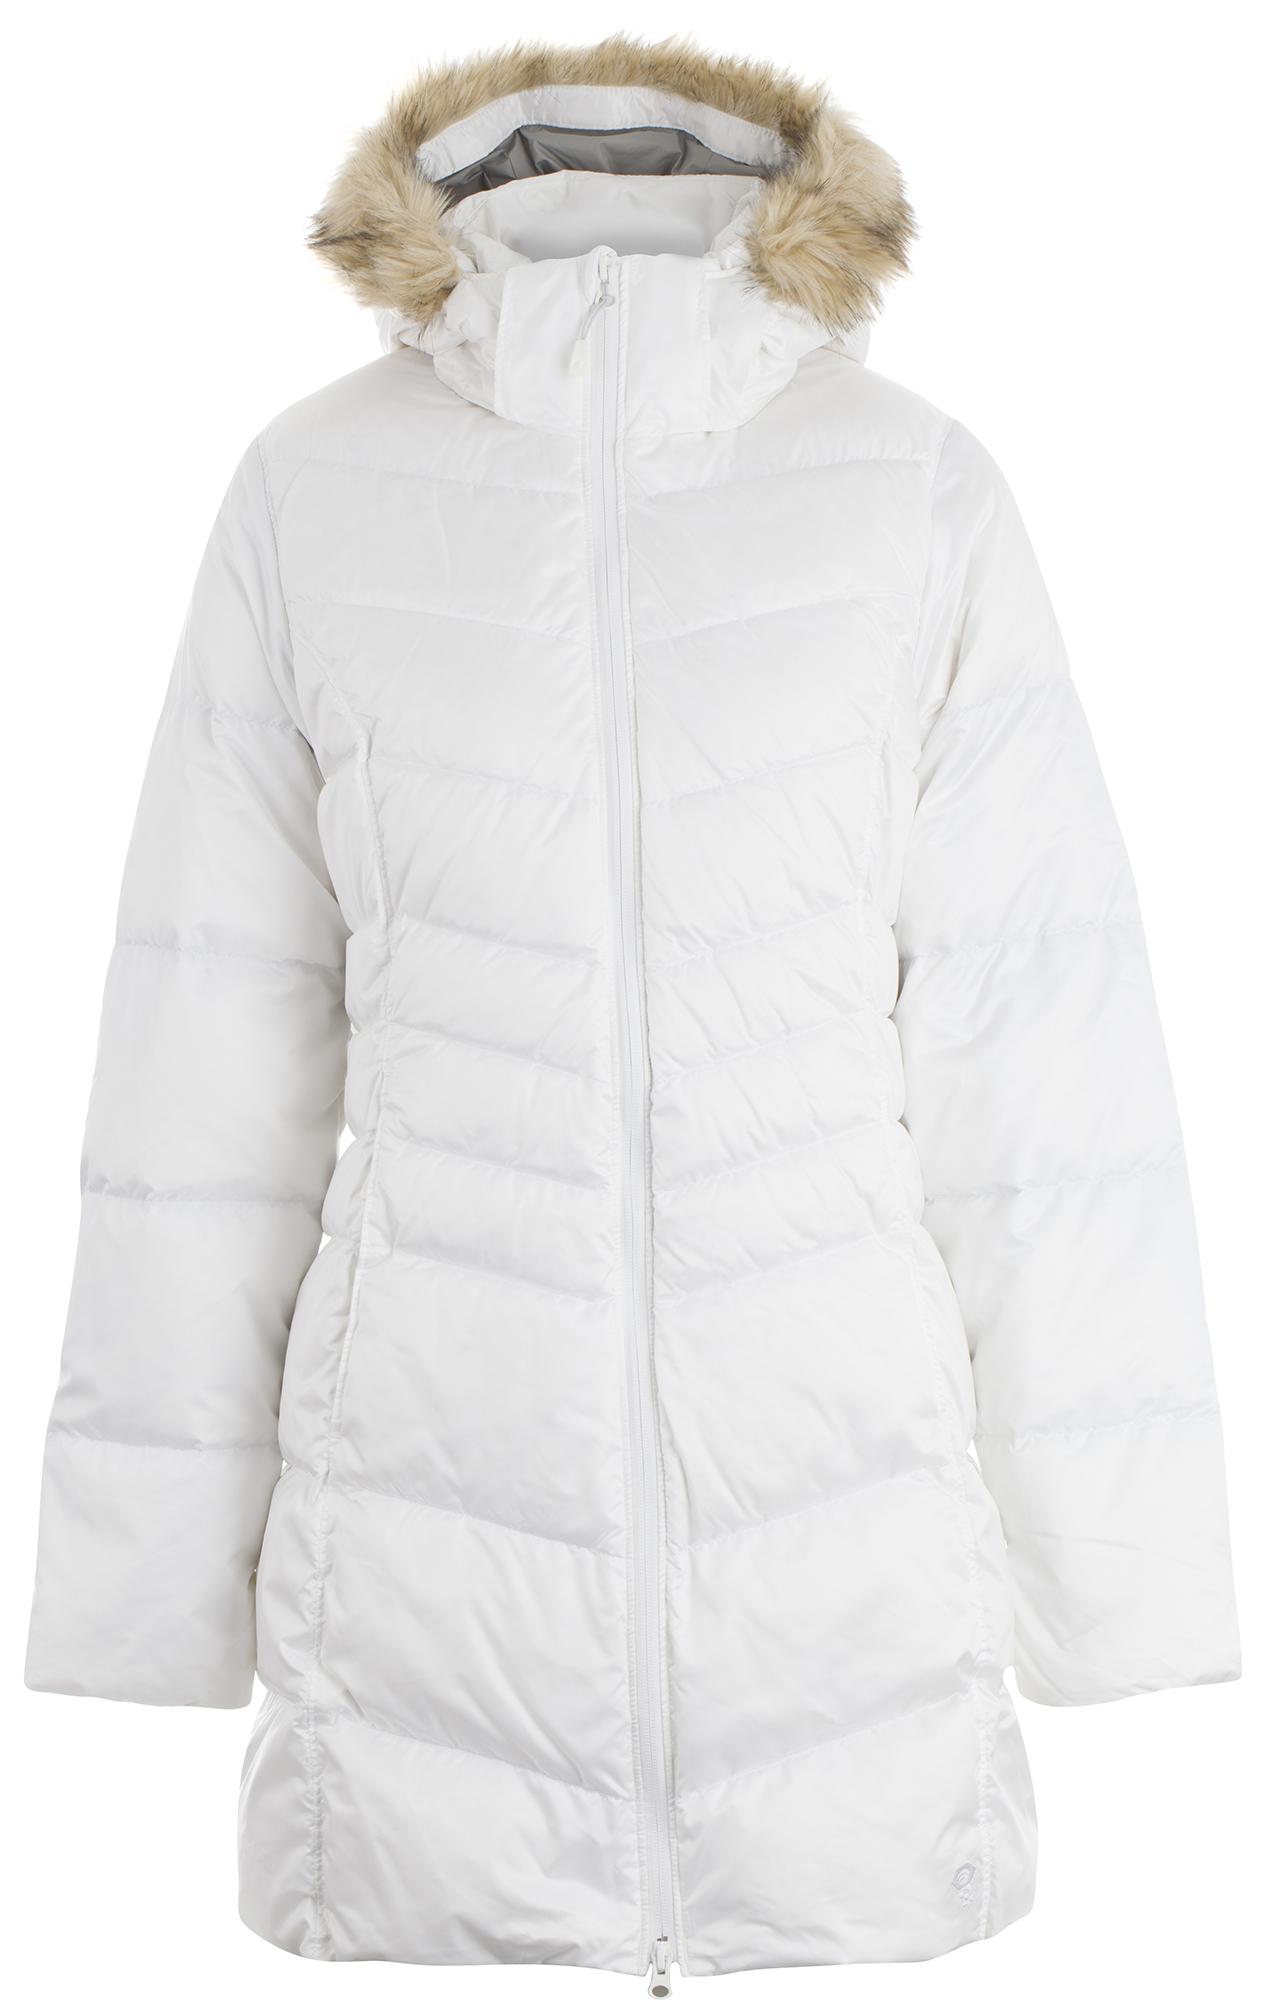 Mountain Hardwear Куртка пуховая женская Mountain Hardwear Downtown mountain hardwear шапка женская mountain hardwear sweet ride